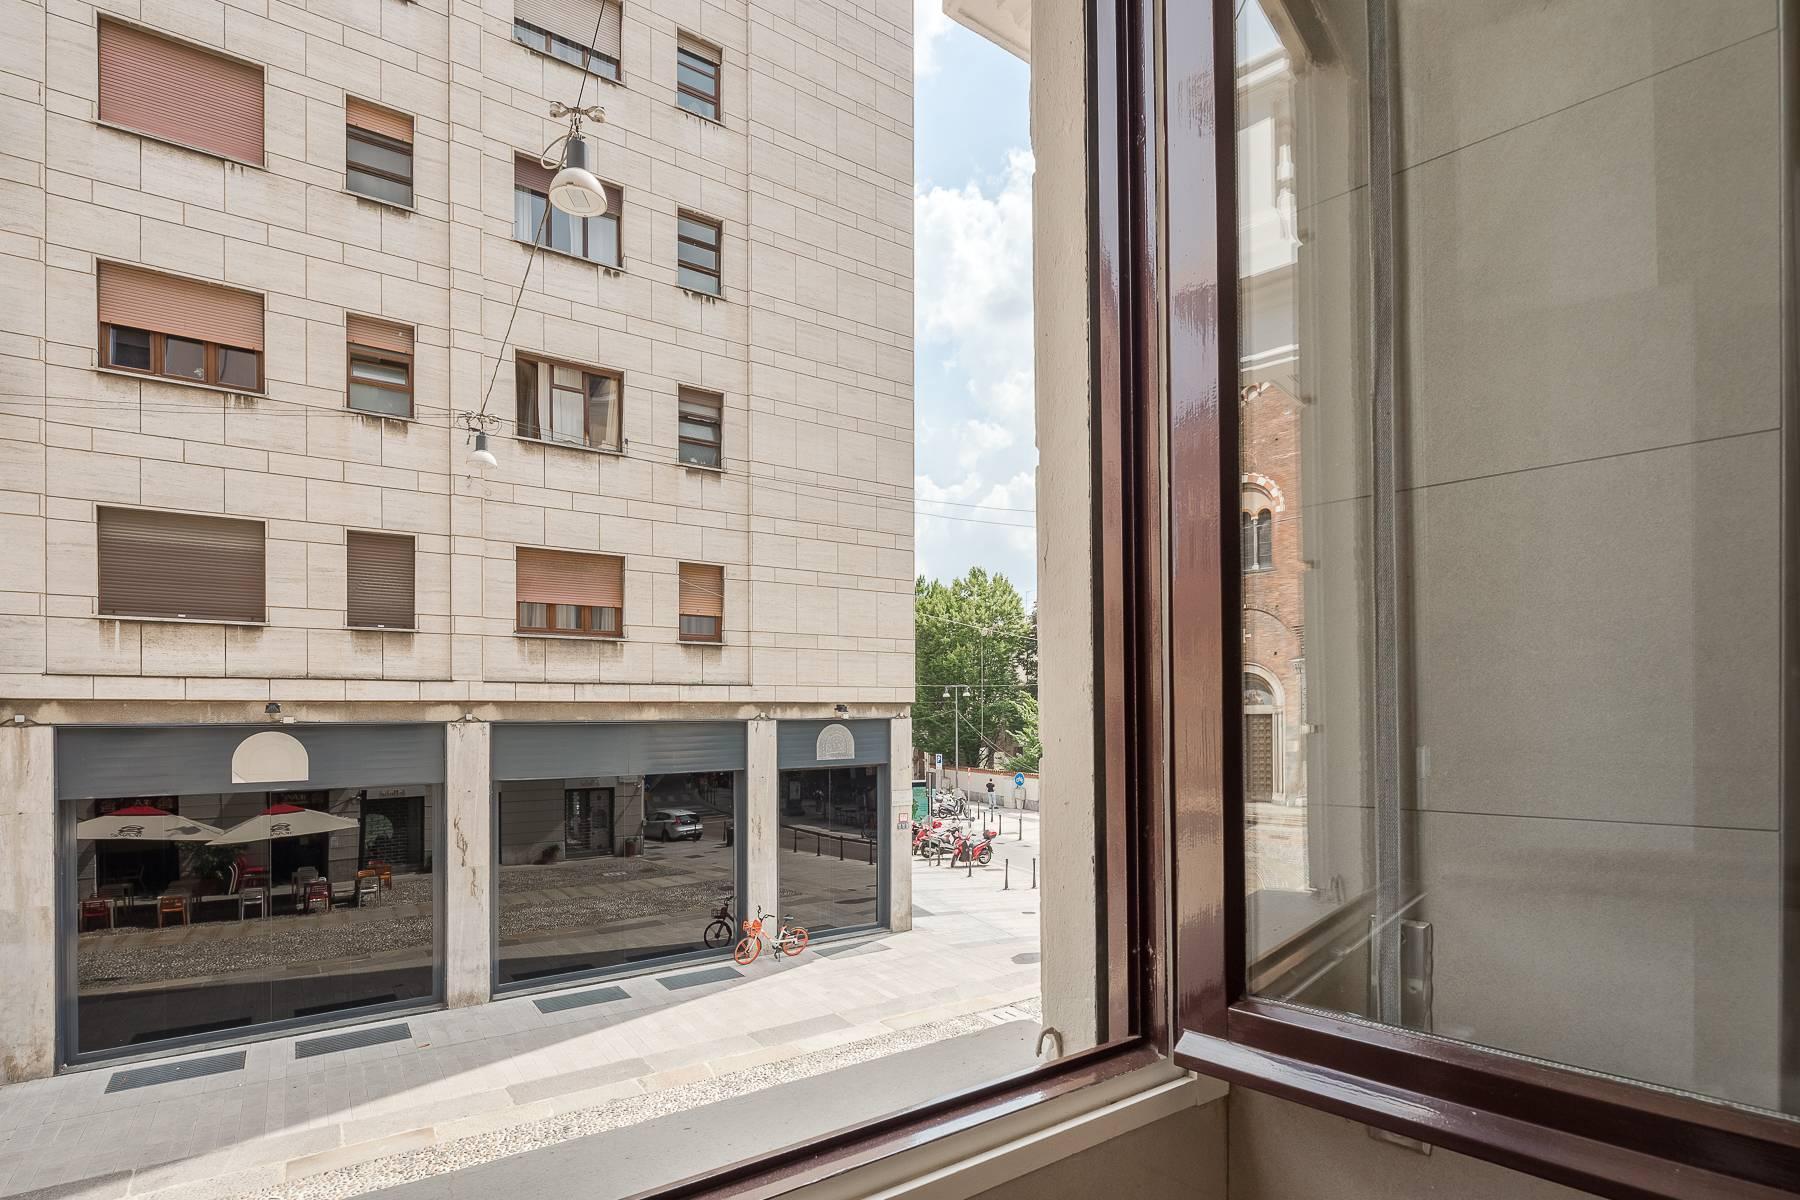 Apartment in an elegant period building located in a prestigious city district - 5